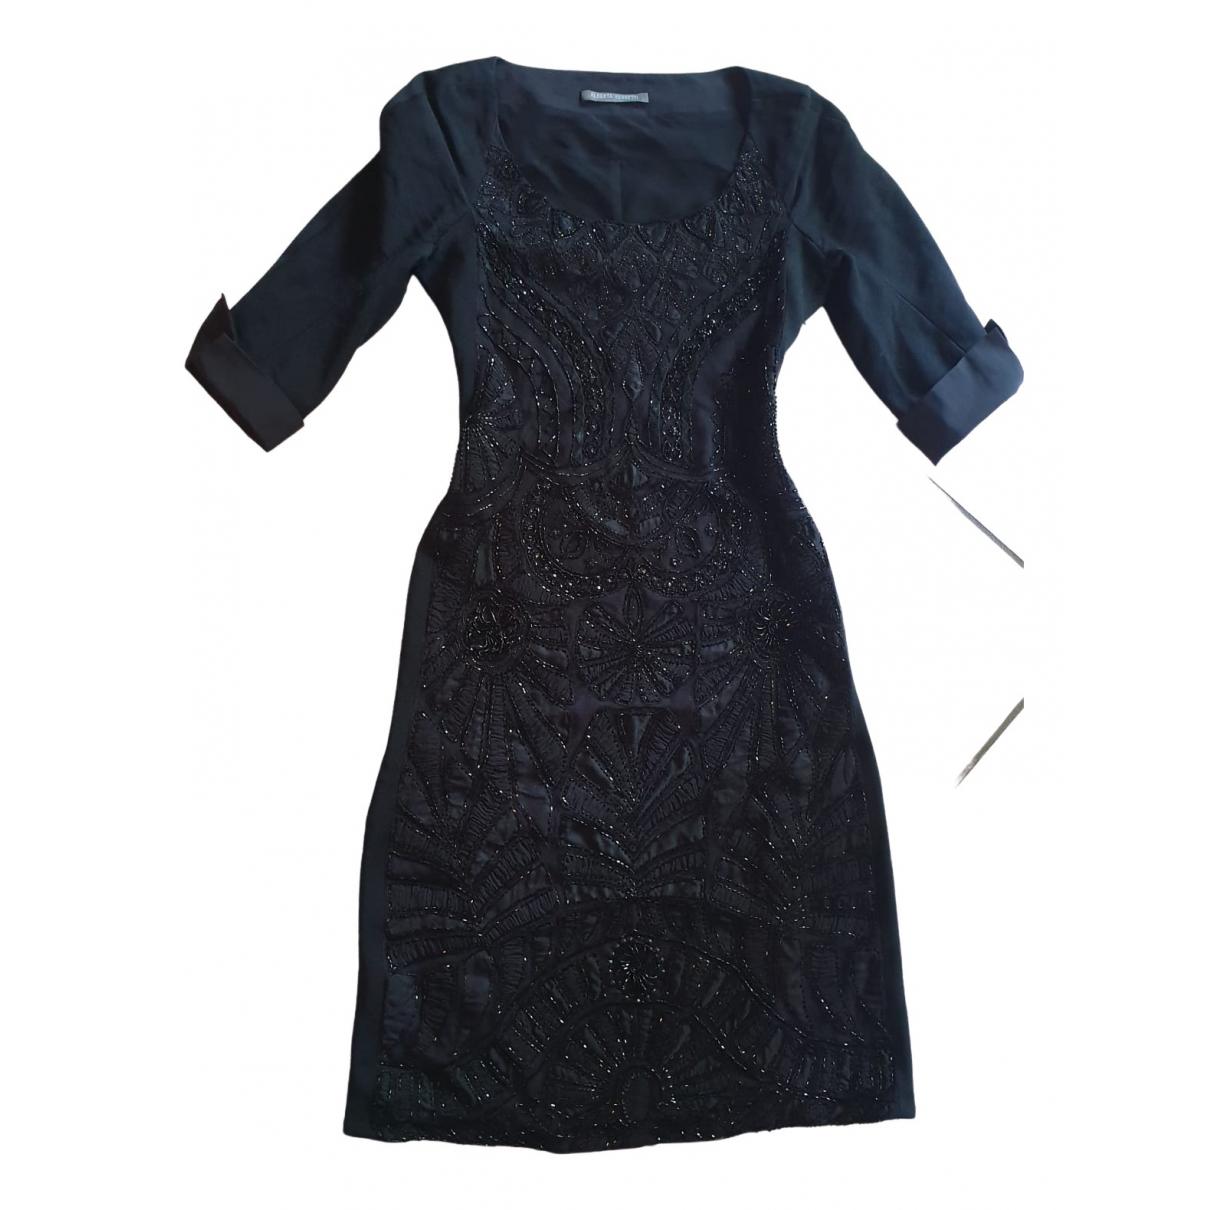 Alberta Ferretti \N Kleid in  Schwarz Polyester